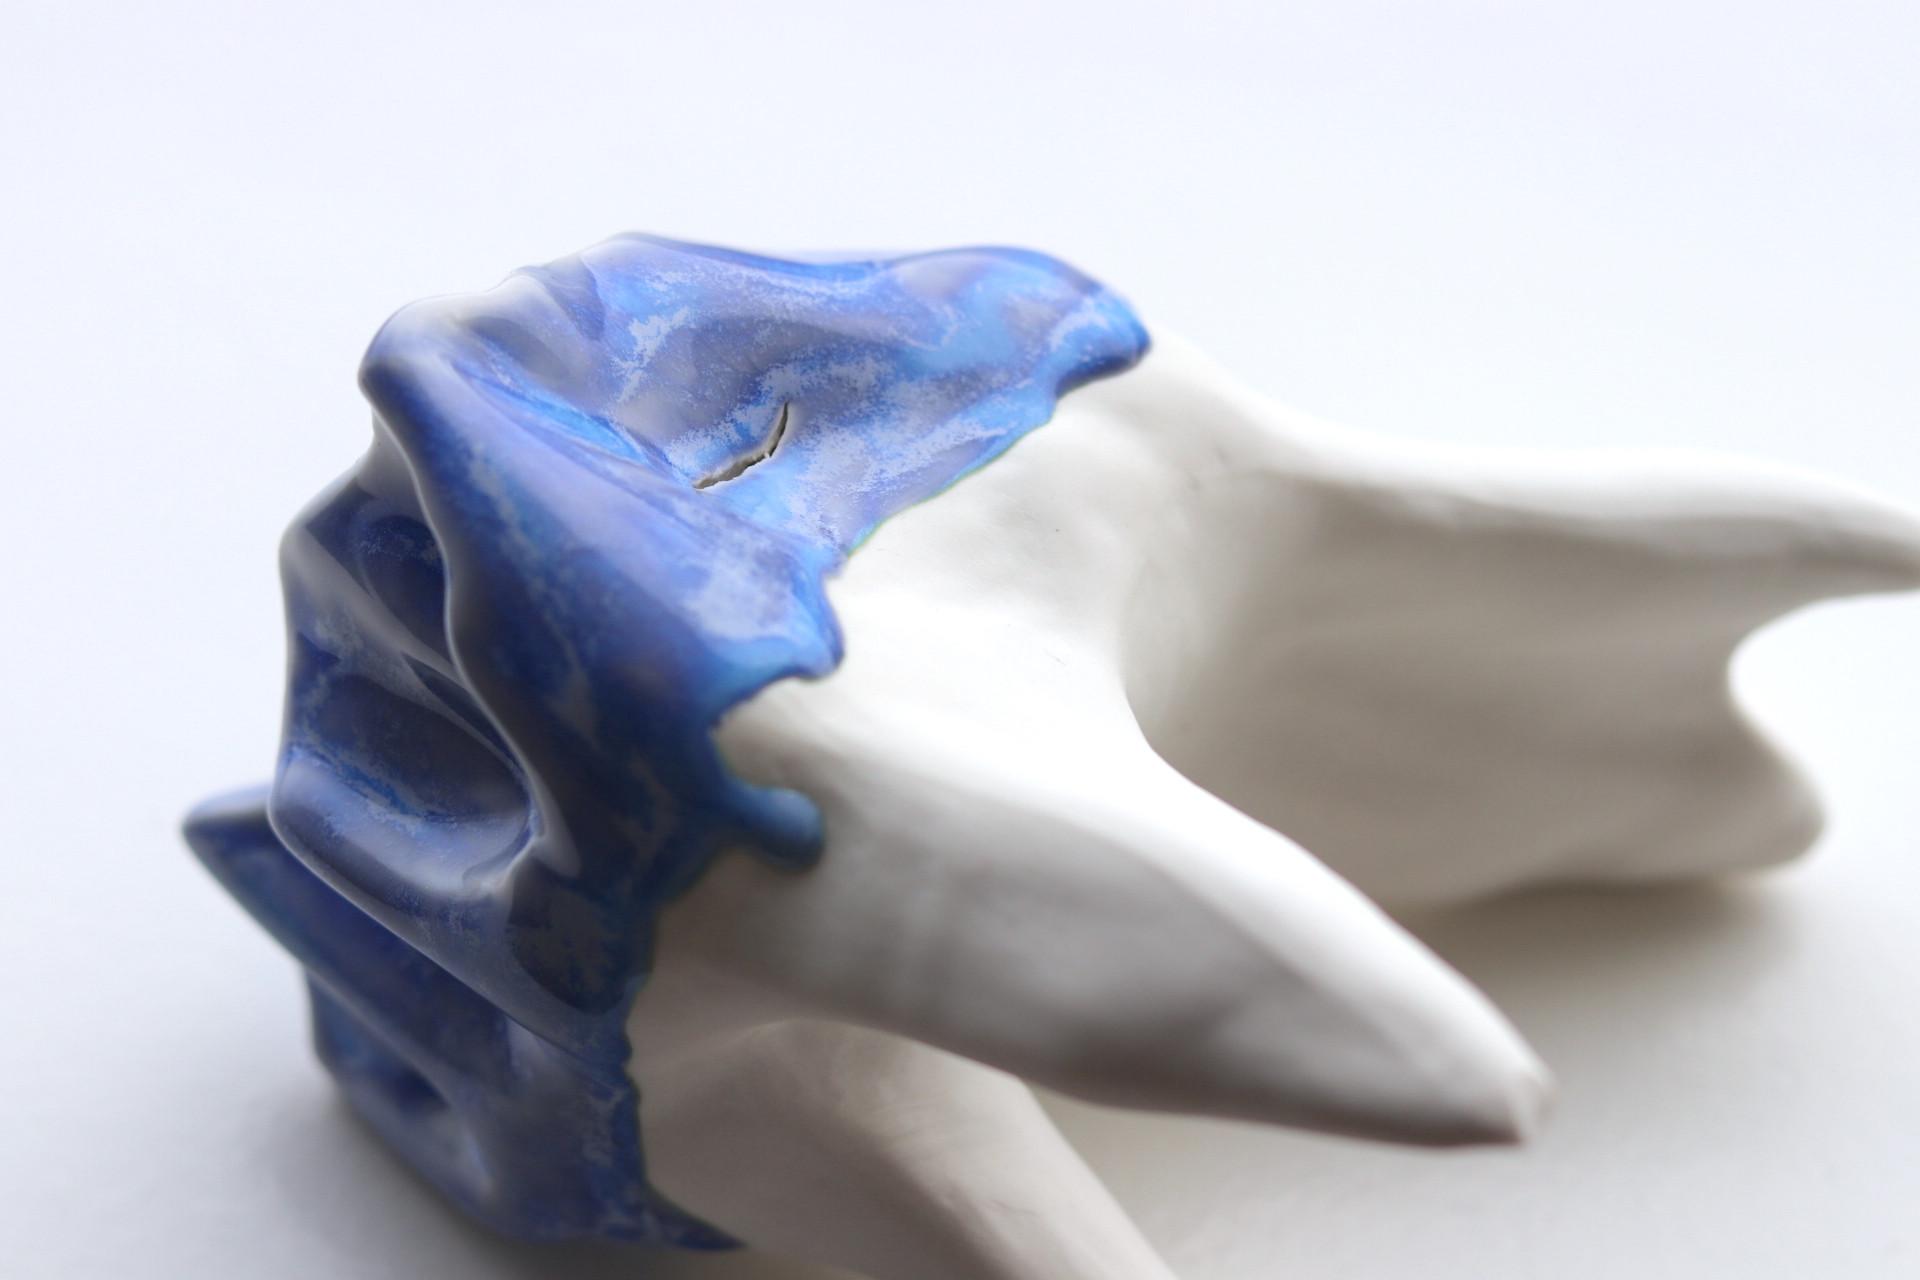 Slipcasted porcelain, oxidation, 2019.